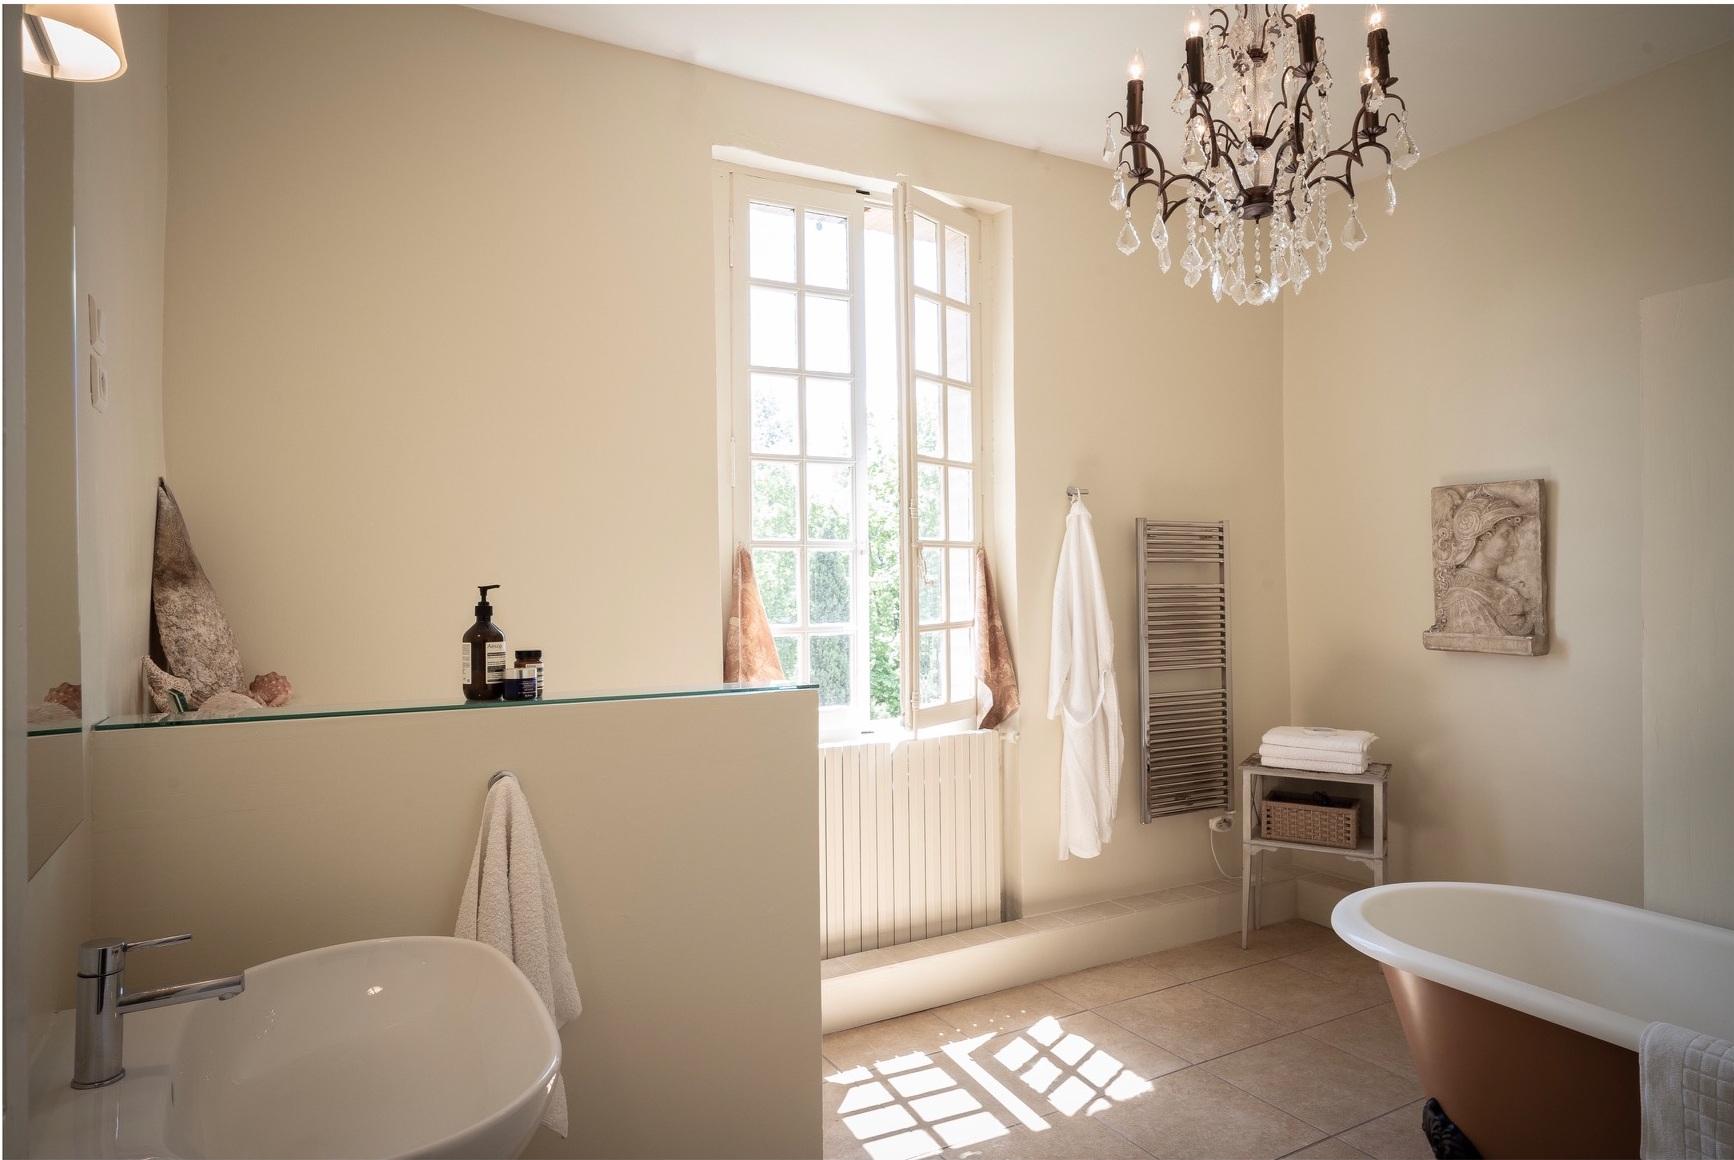 Beaumont bathroom.JPG